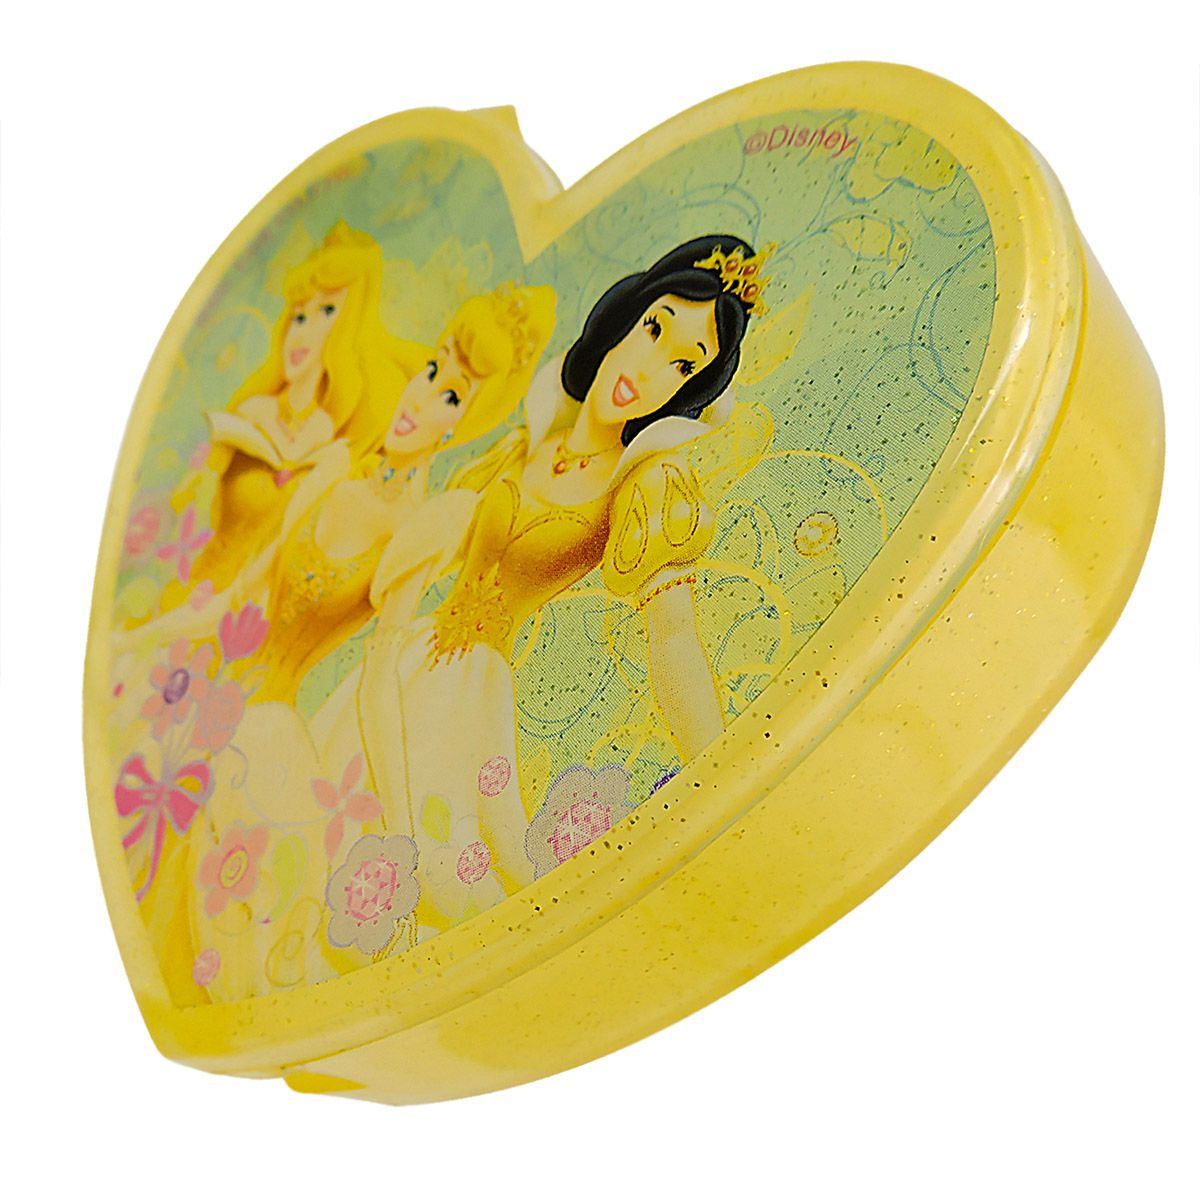 400 Mini Adesivos Mais Porta Adesivos Personagens Disney